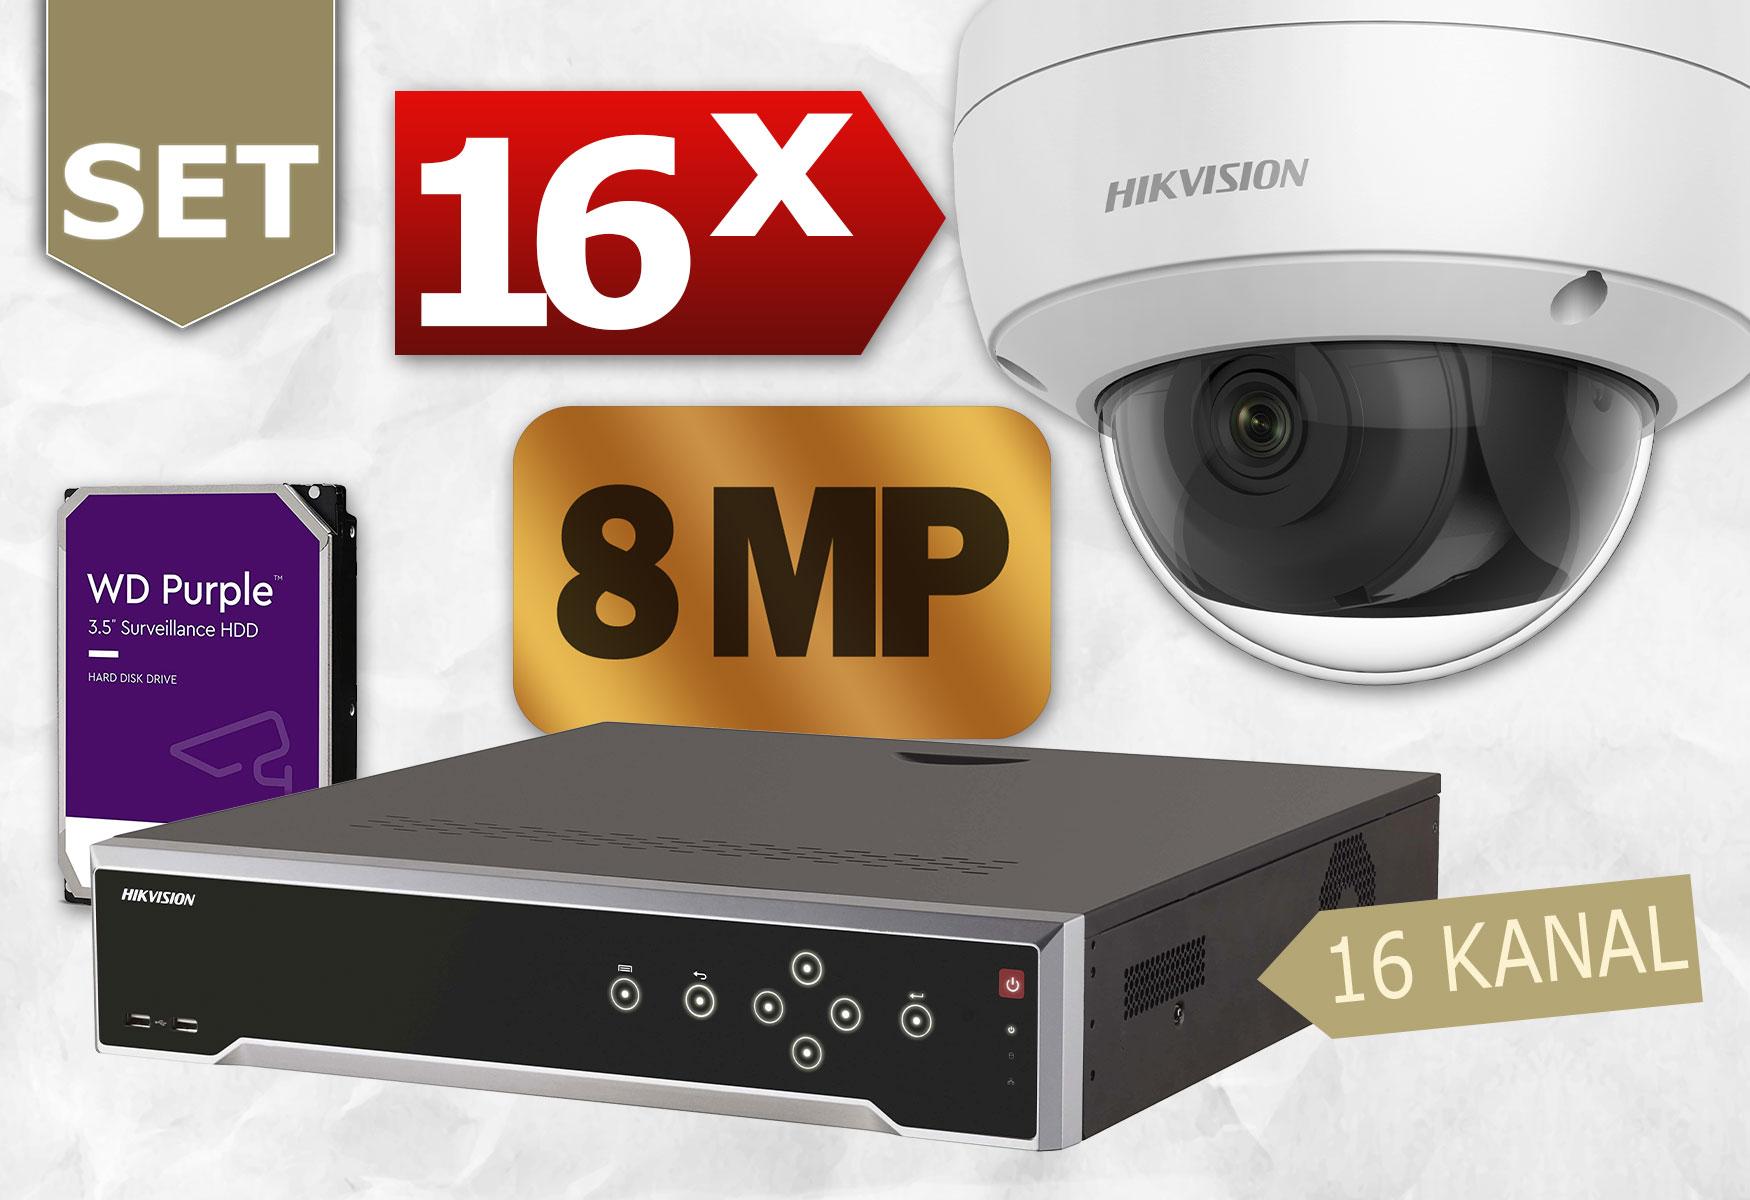 Dome-16x-8MP-16-Kanal-Netzwerkgeraet-ueberwachungskamera_set_nvr_ip_kamera-GekkoStuff_2.jpg